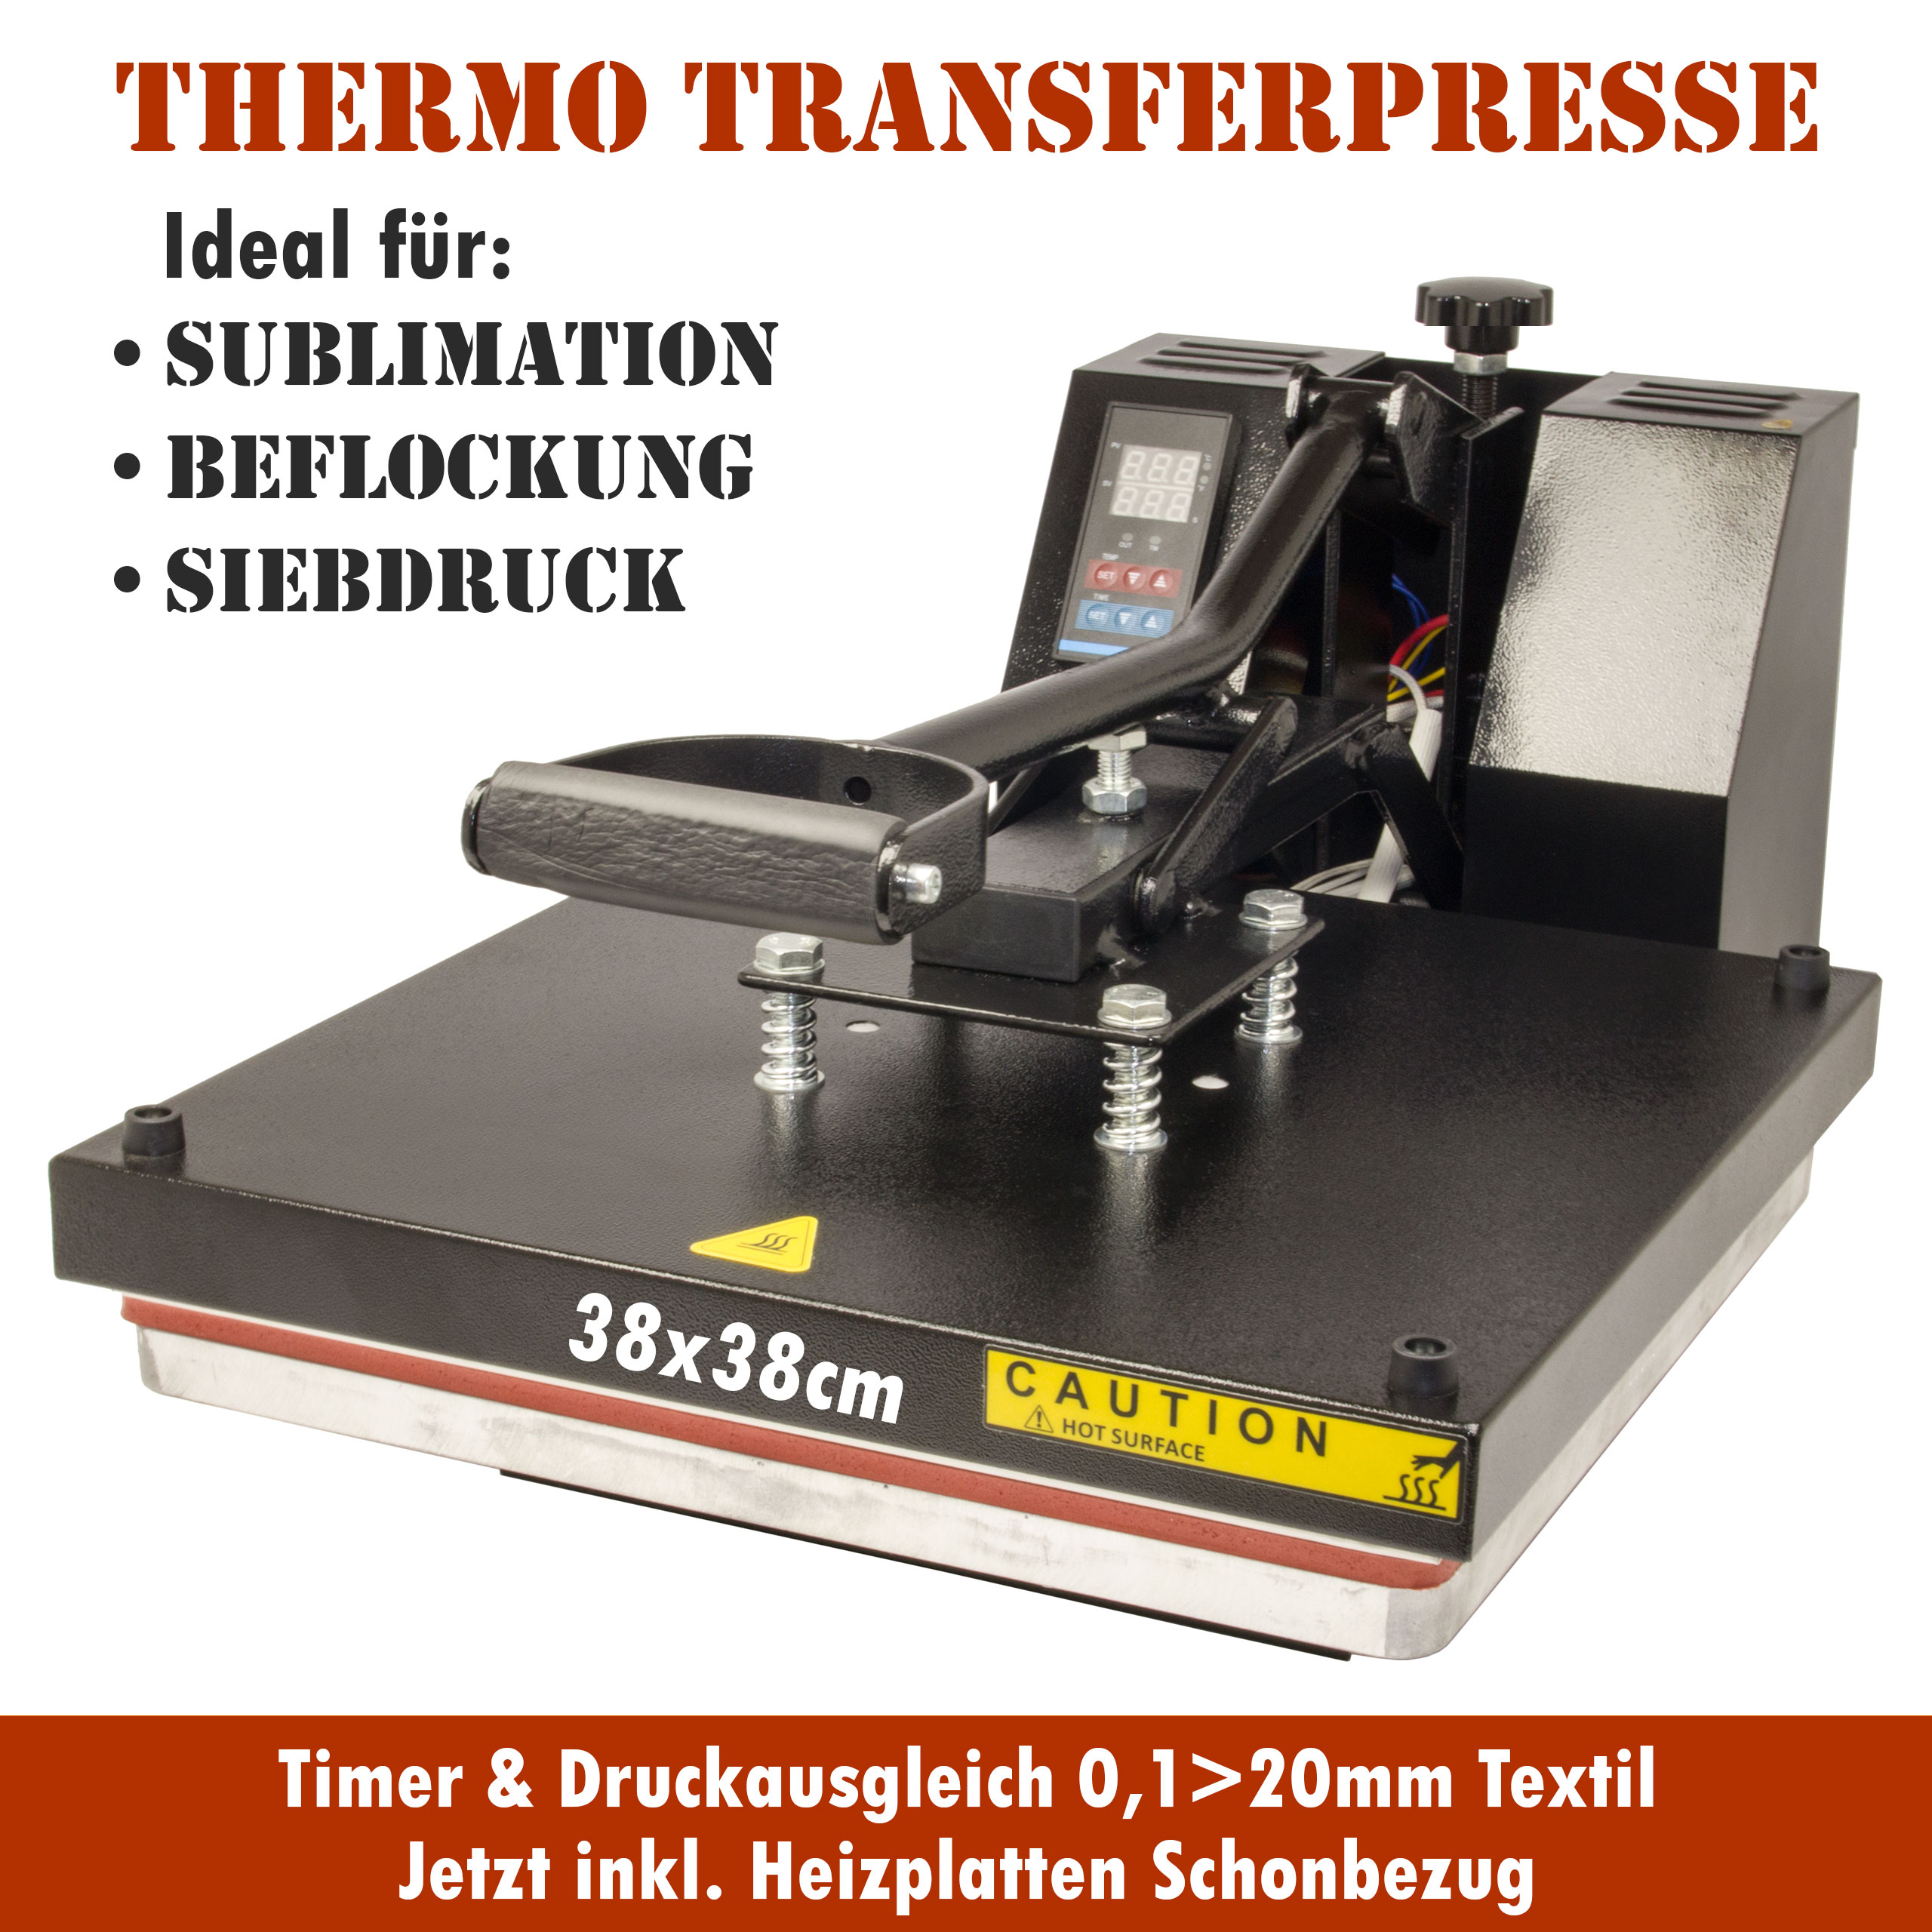 HobbyCut H001-S Transferpresse 38cm x 38cm Textilpresse 1800 Watt